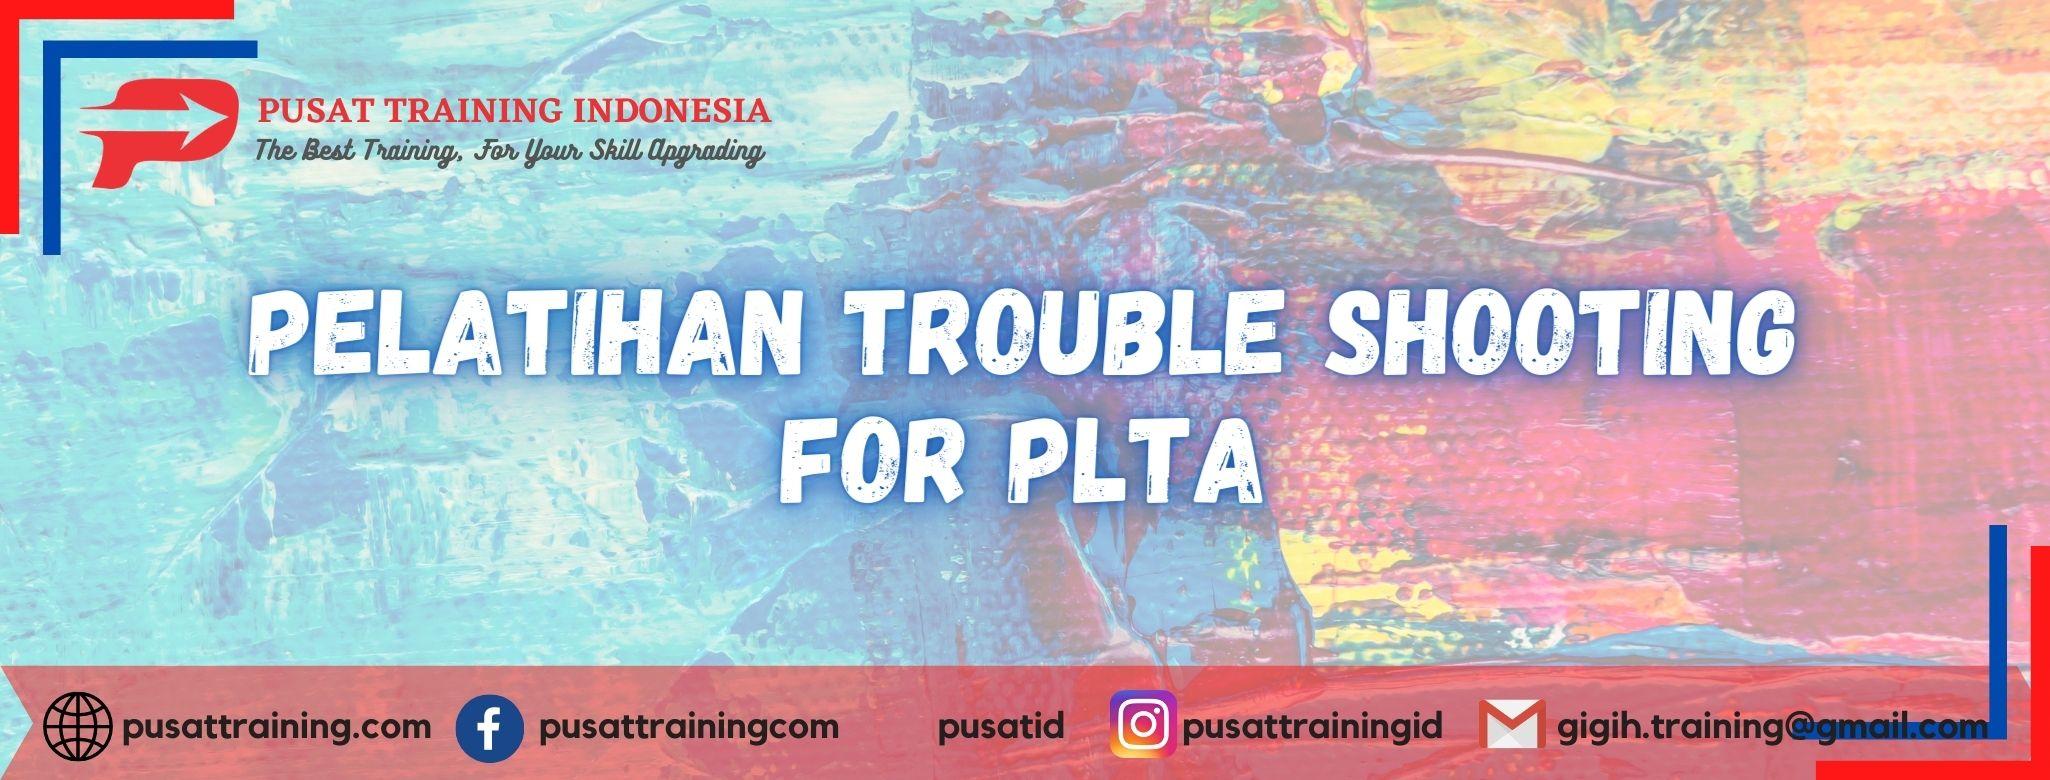 Pelatihan-Trouble-Shooting-for-PLTA